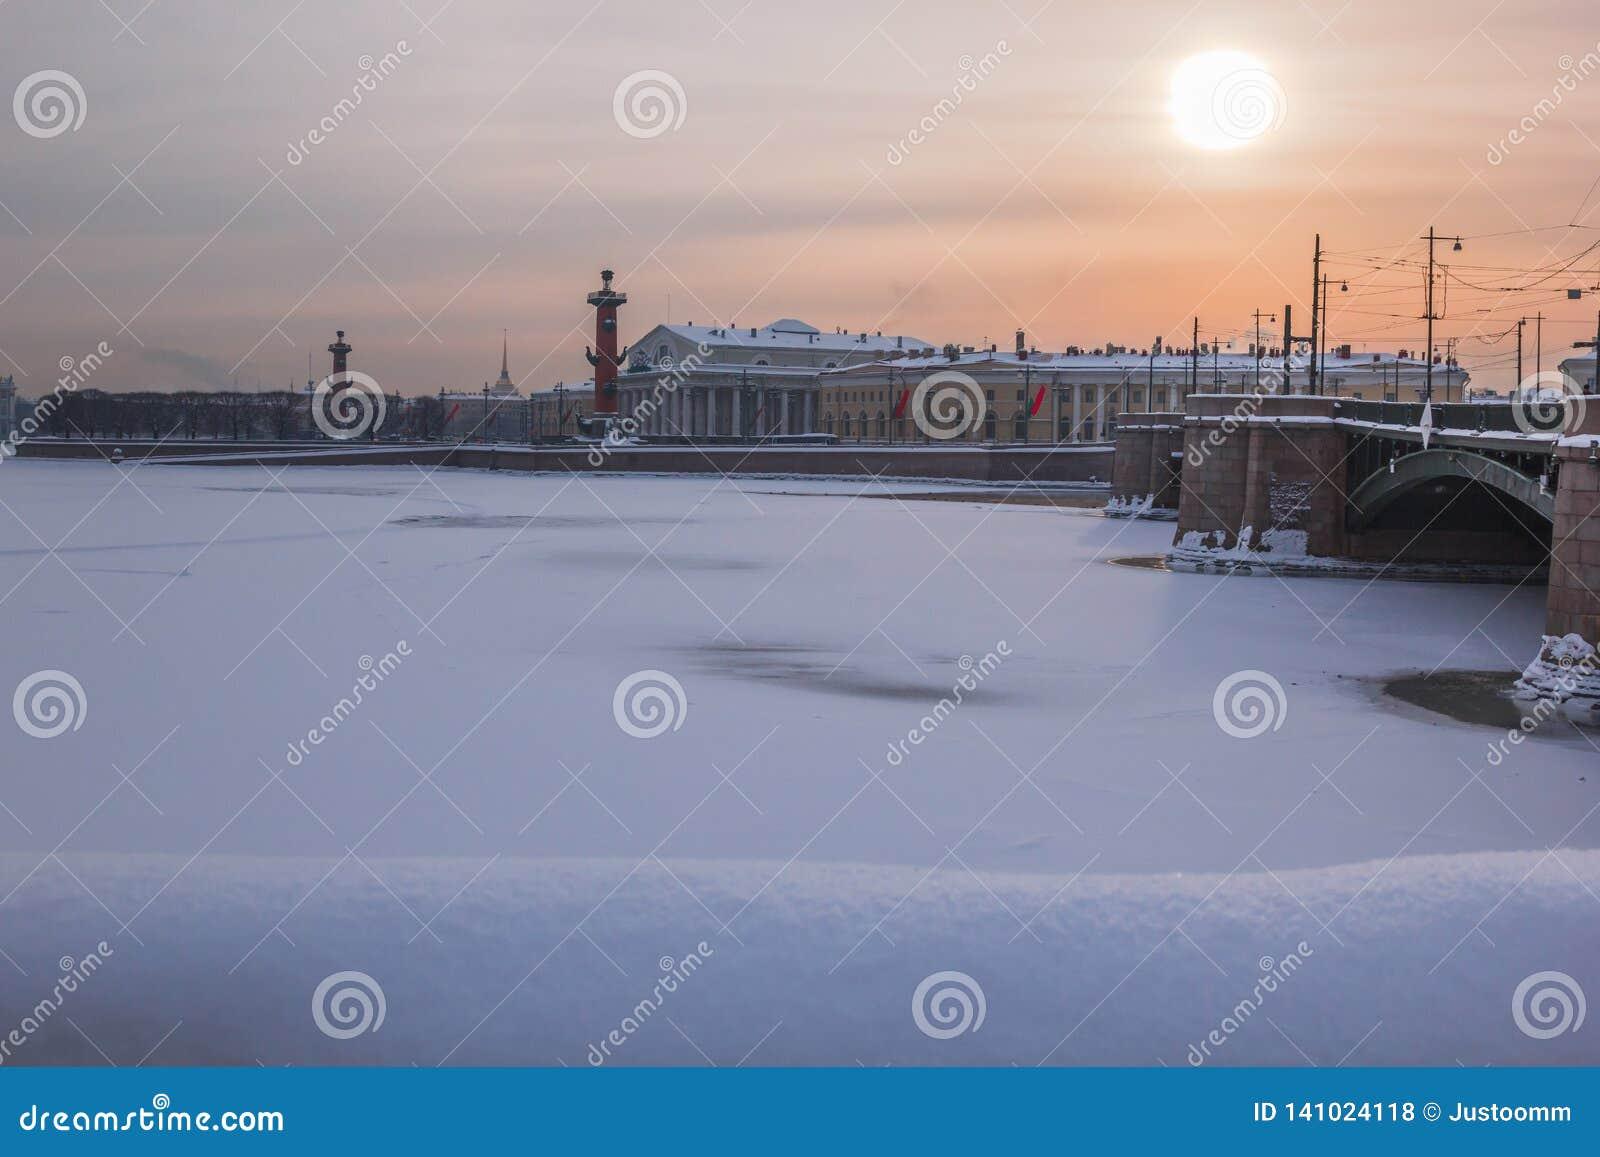 Heilige Petersburg, Rusland - Januari 27, 2019: De wintermening van St. Petersburg, Rusland, met de Paleisbrug, Rostral